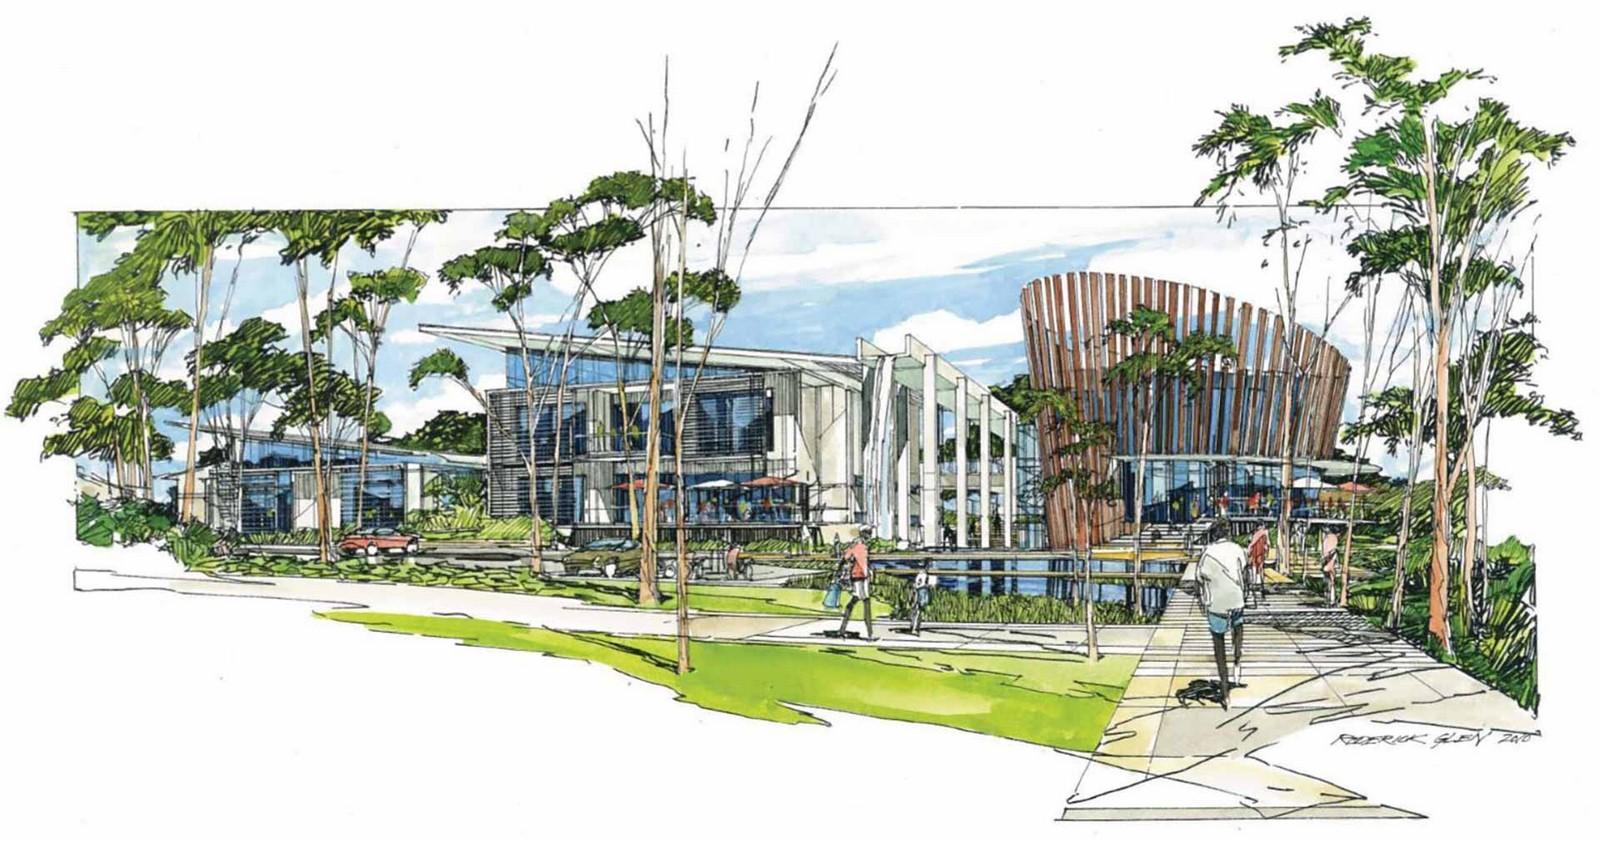 Sustainable buildings - Australian Centre - sheet 2